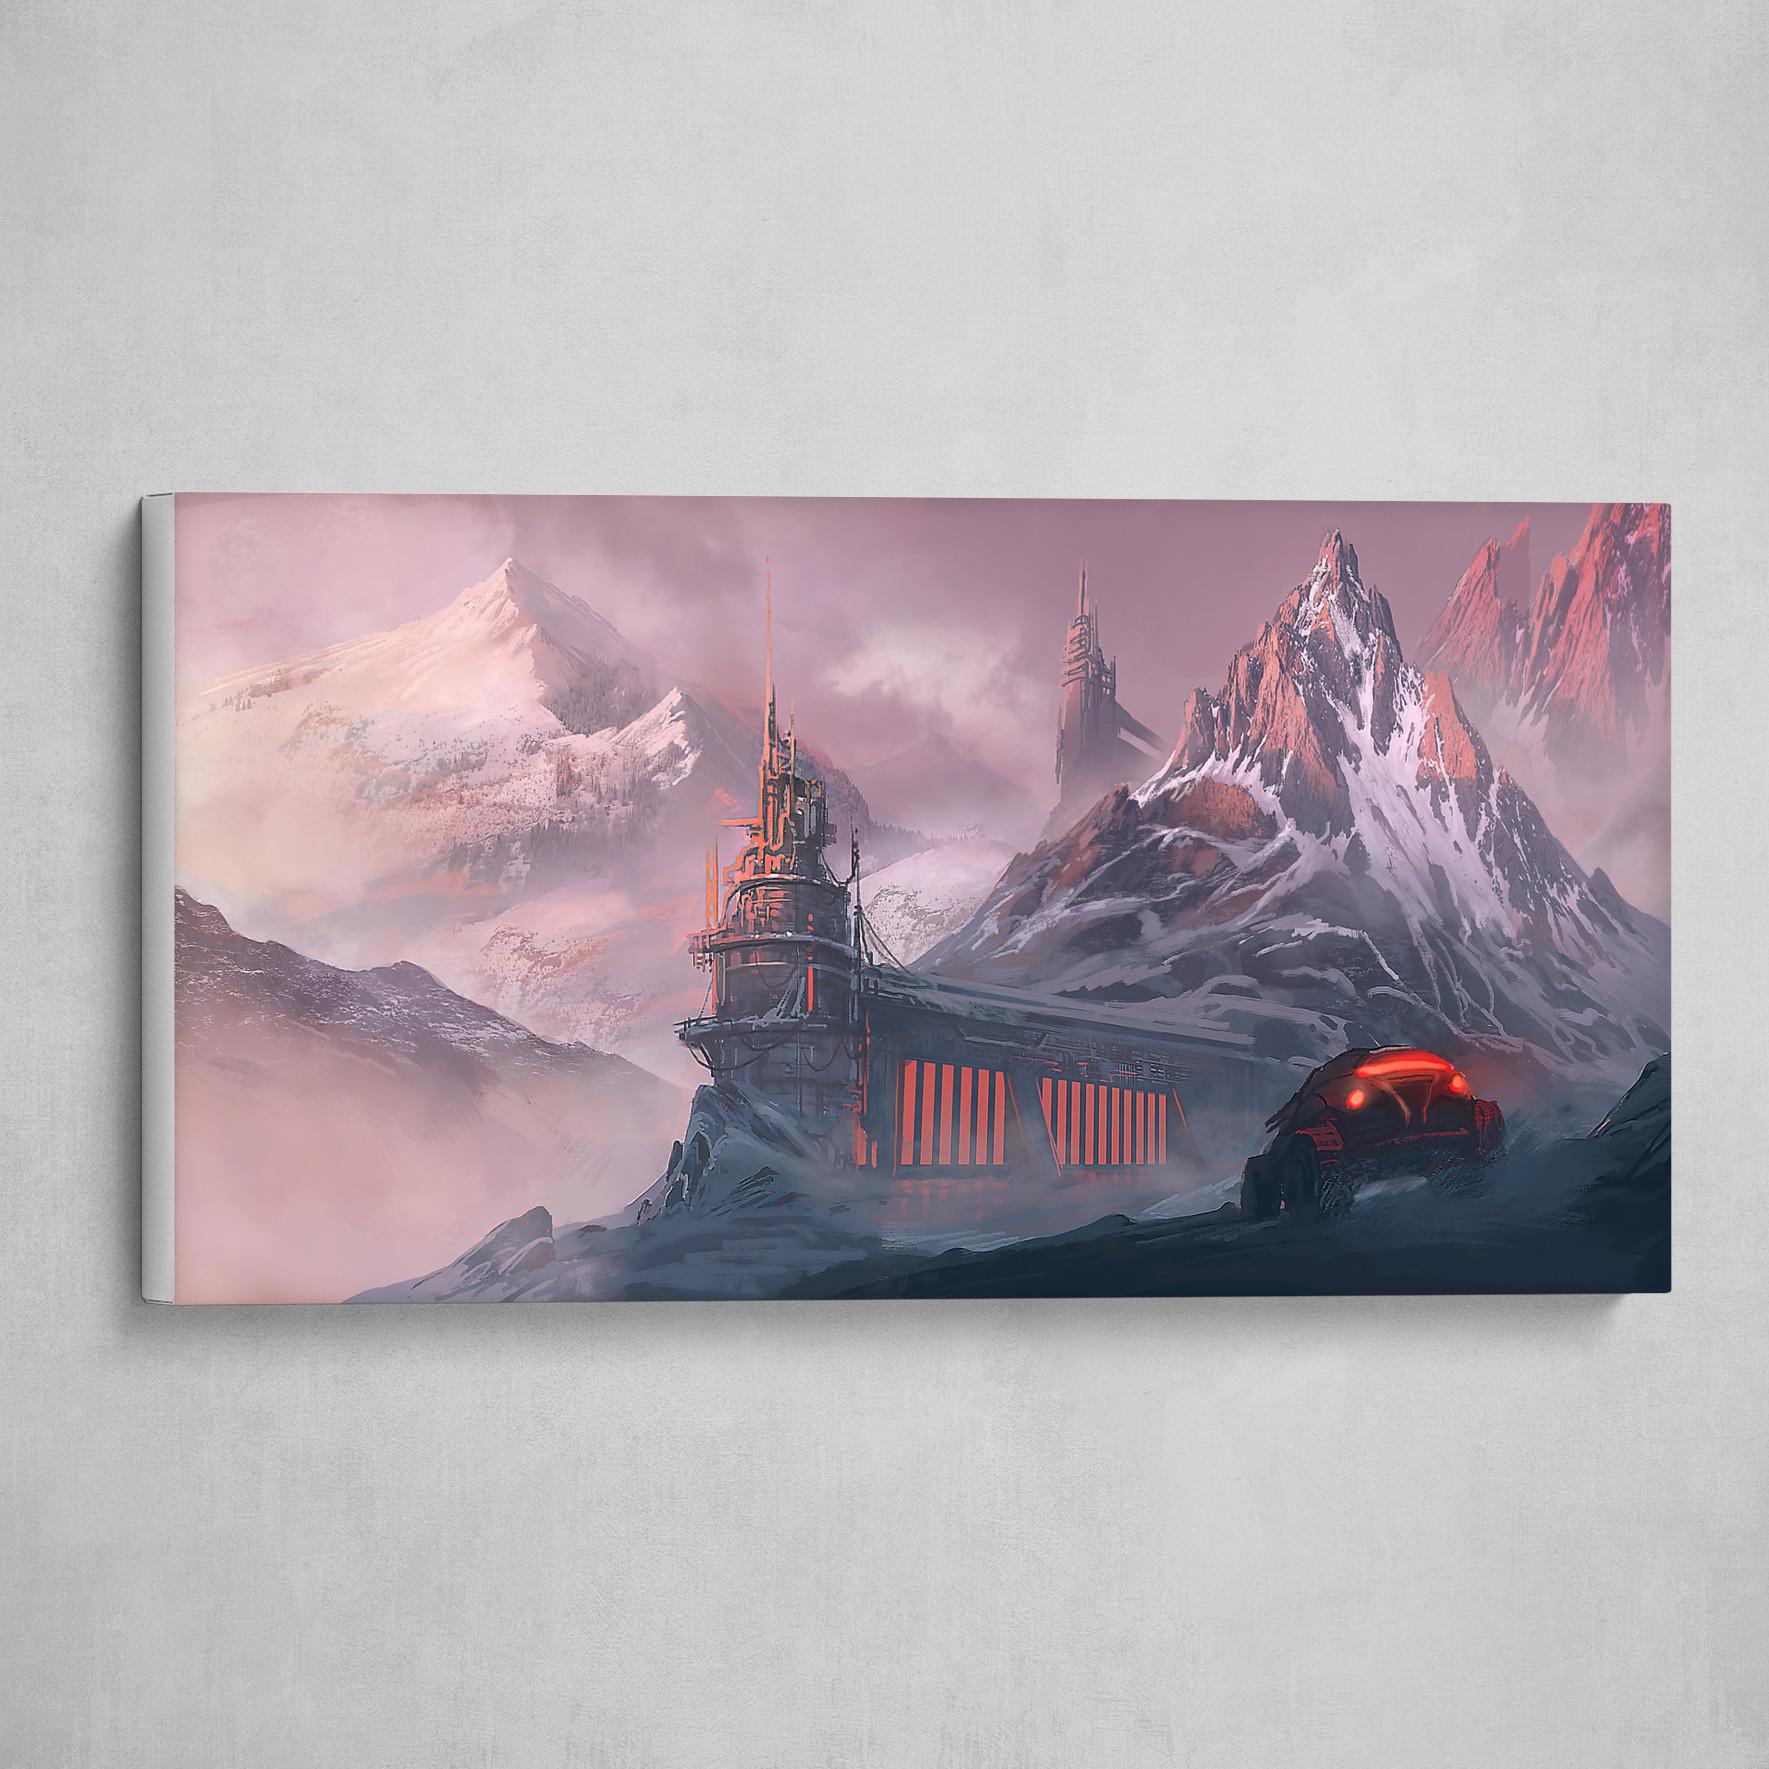 Mountains' Facility